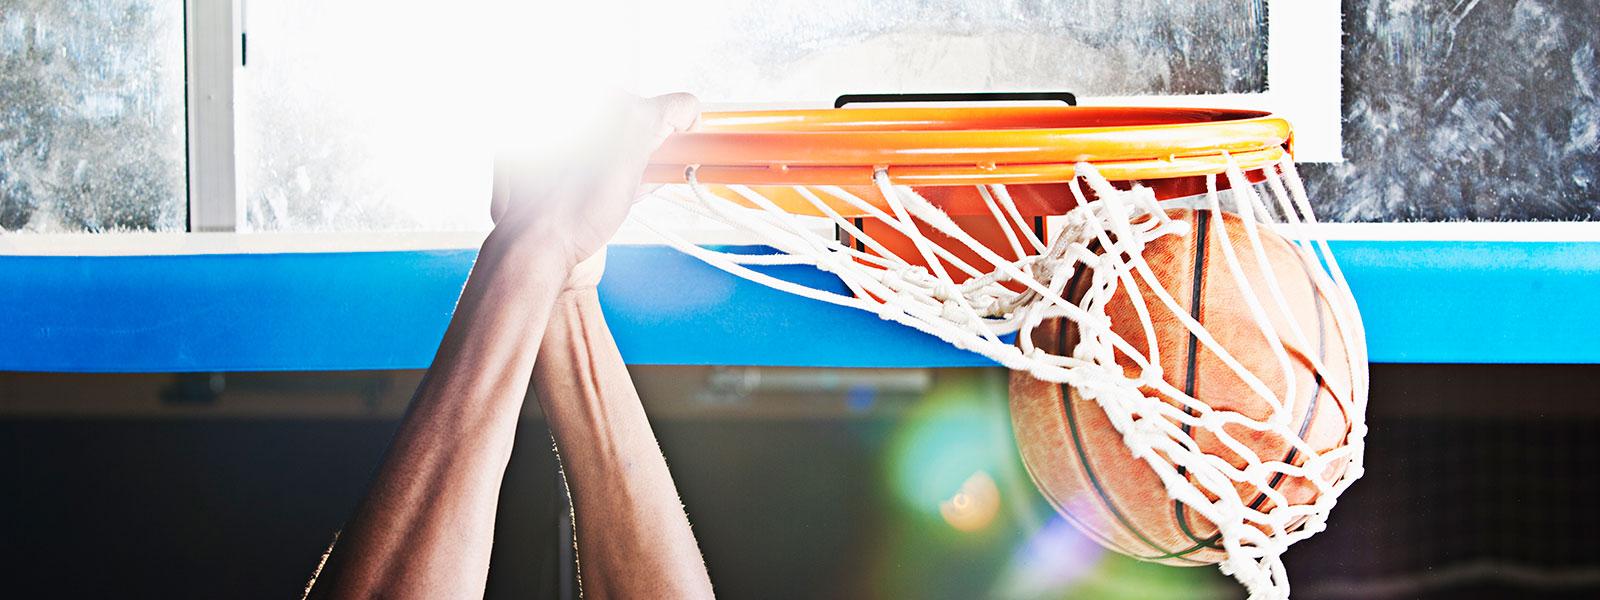 Clergy basketball